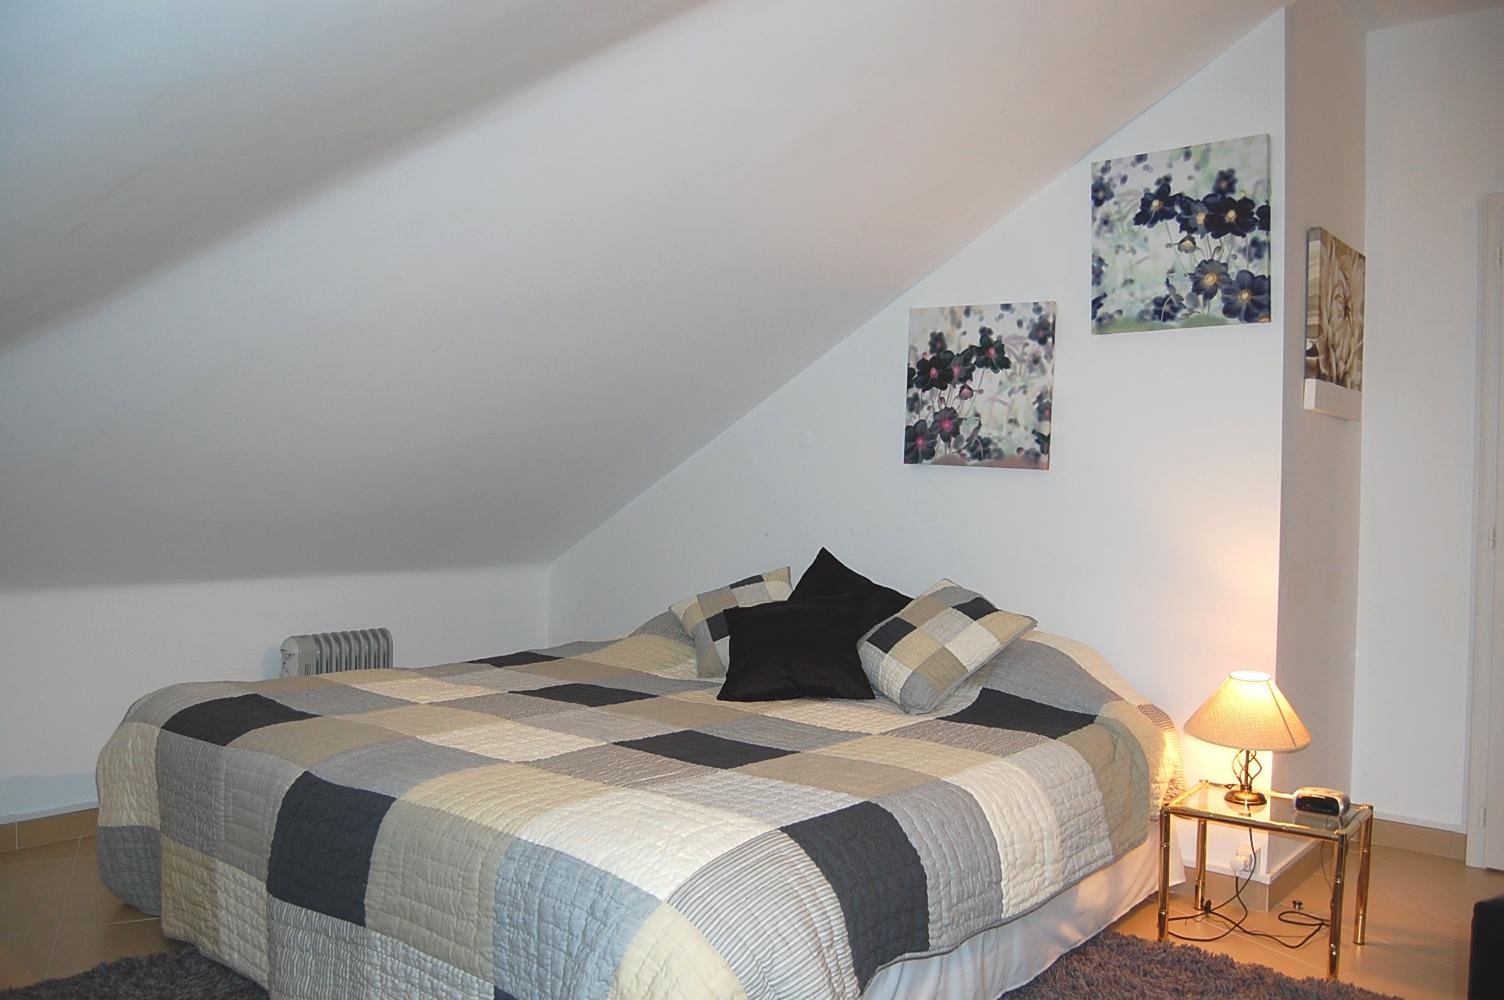 Quarto/ Bedroom